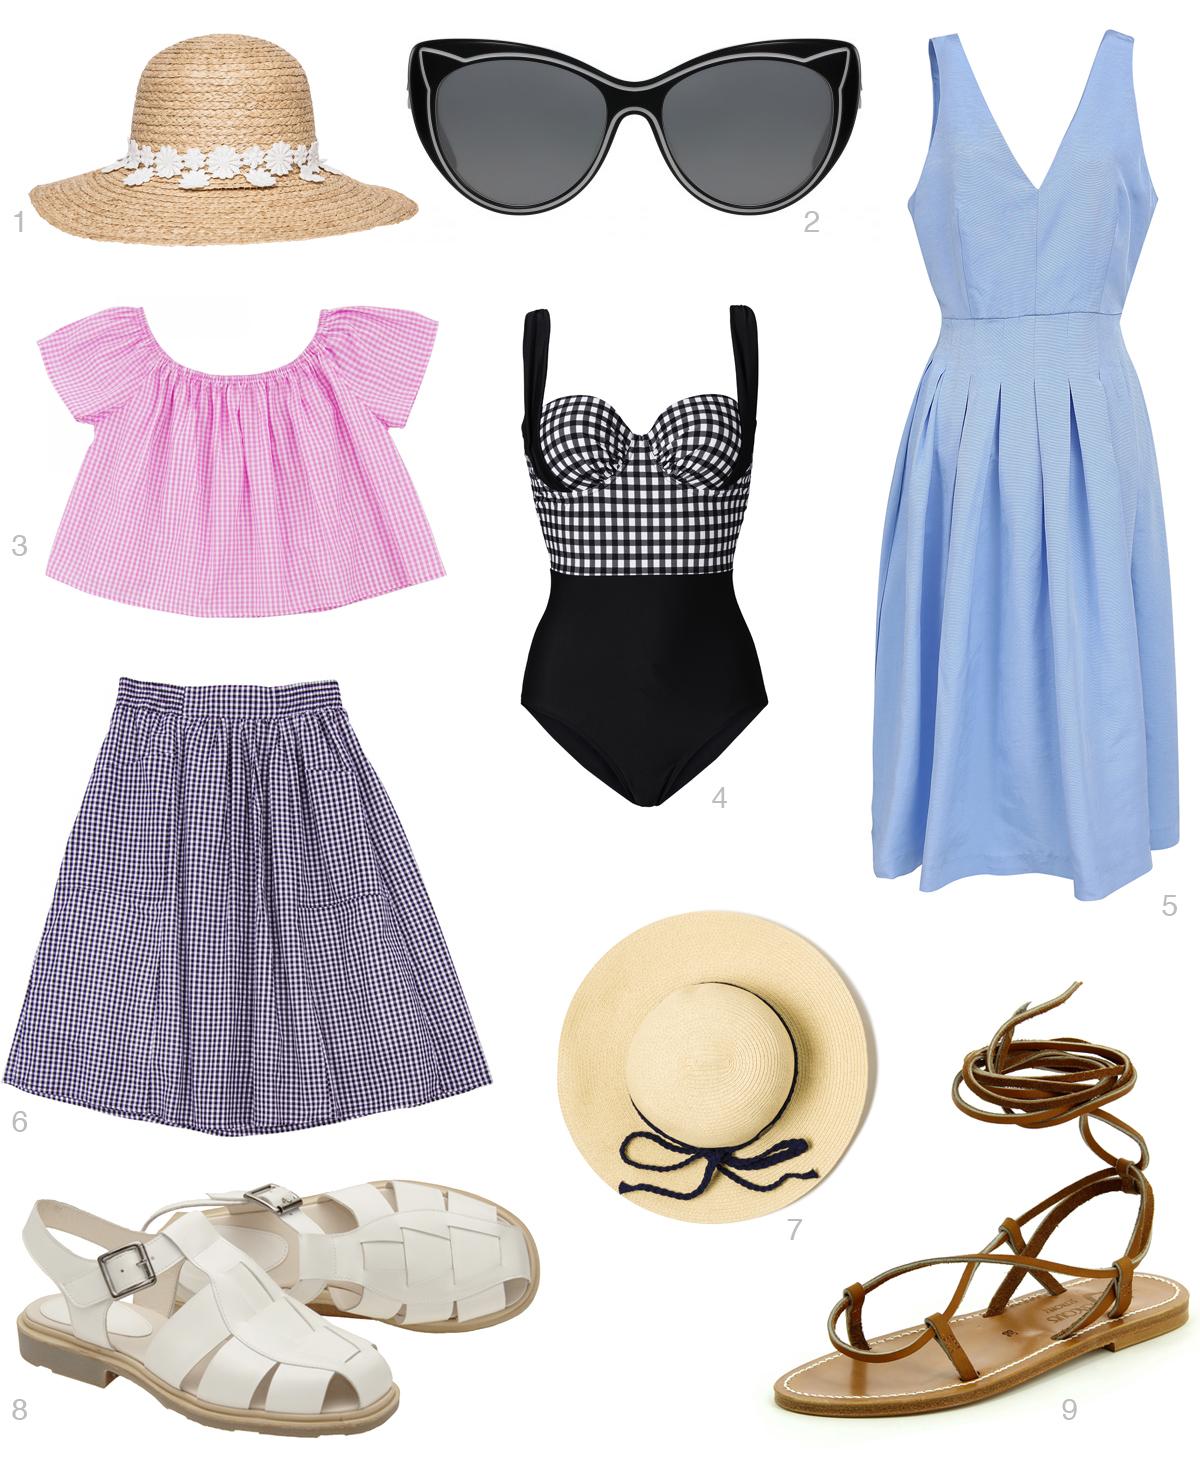 brigitte-bardot-sixties-style-fashion-editorial